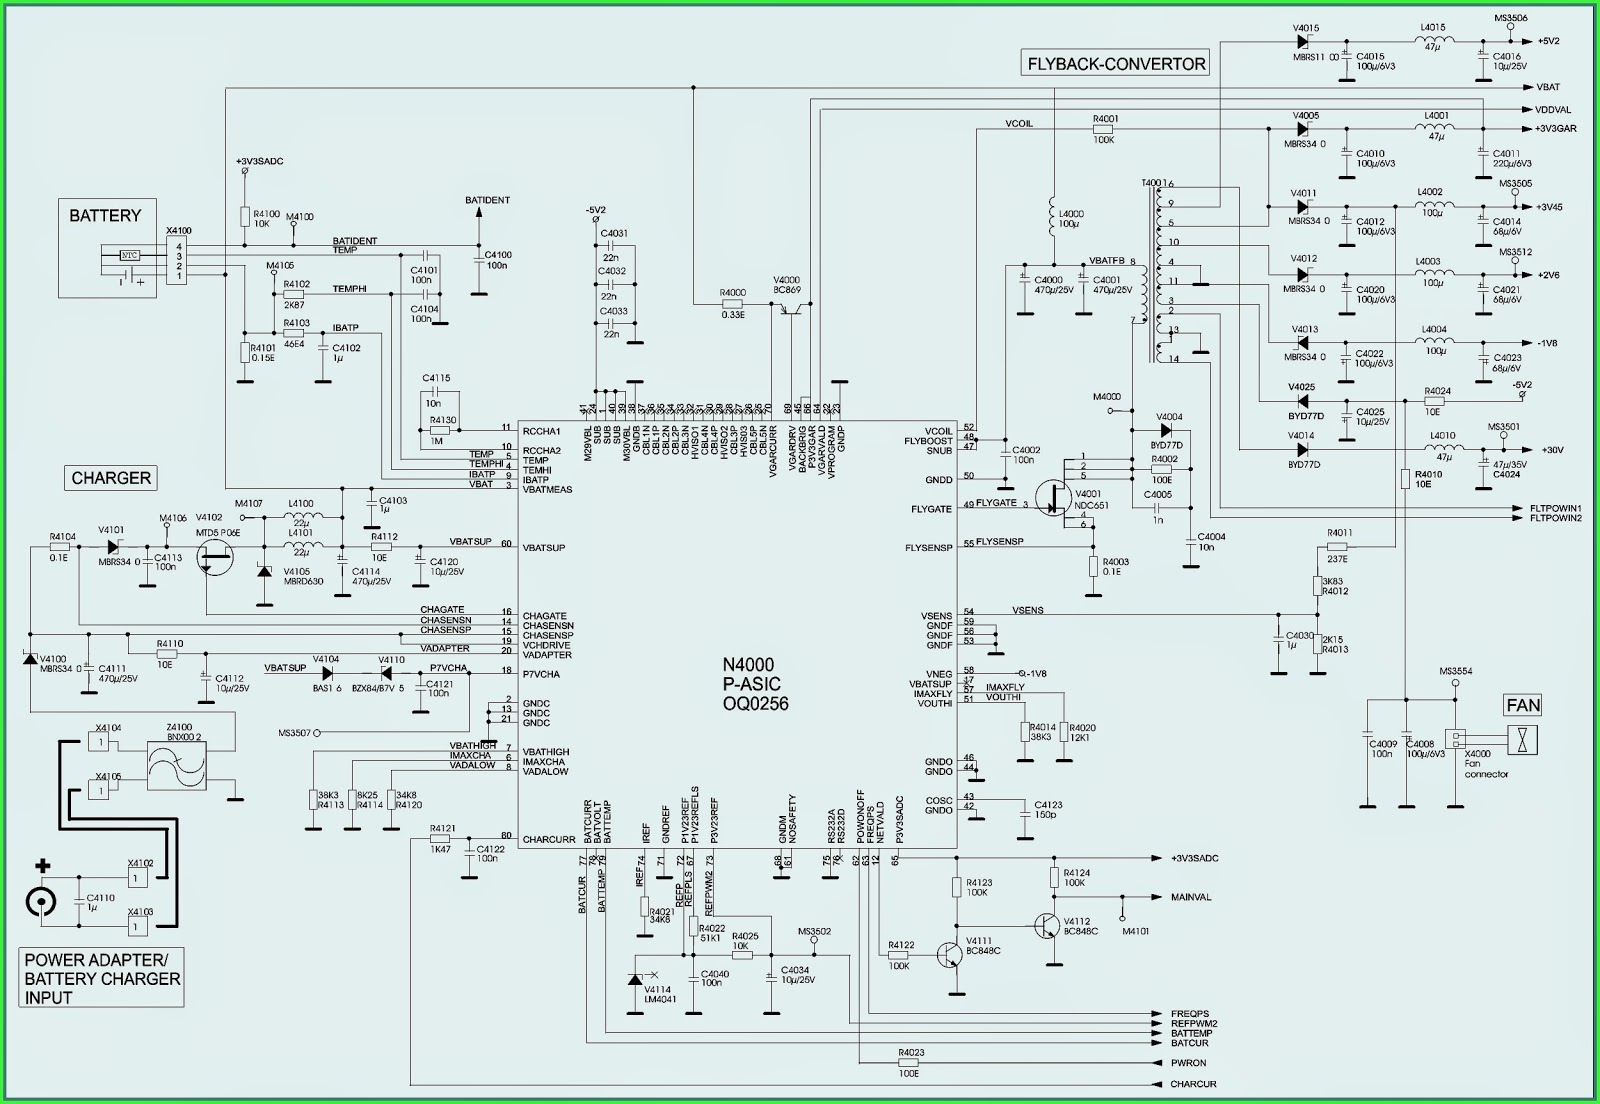 2005 hyundai xg350 fuse box location hyundai auto wiring [ 1600 x 1104 Pixel ]